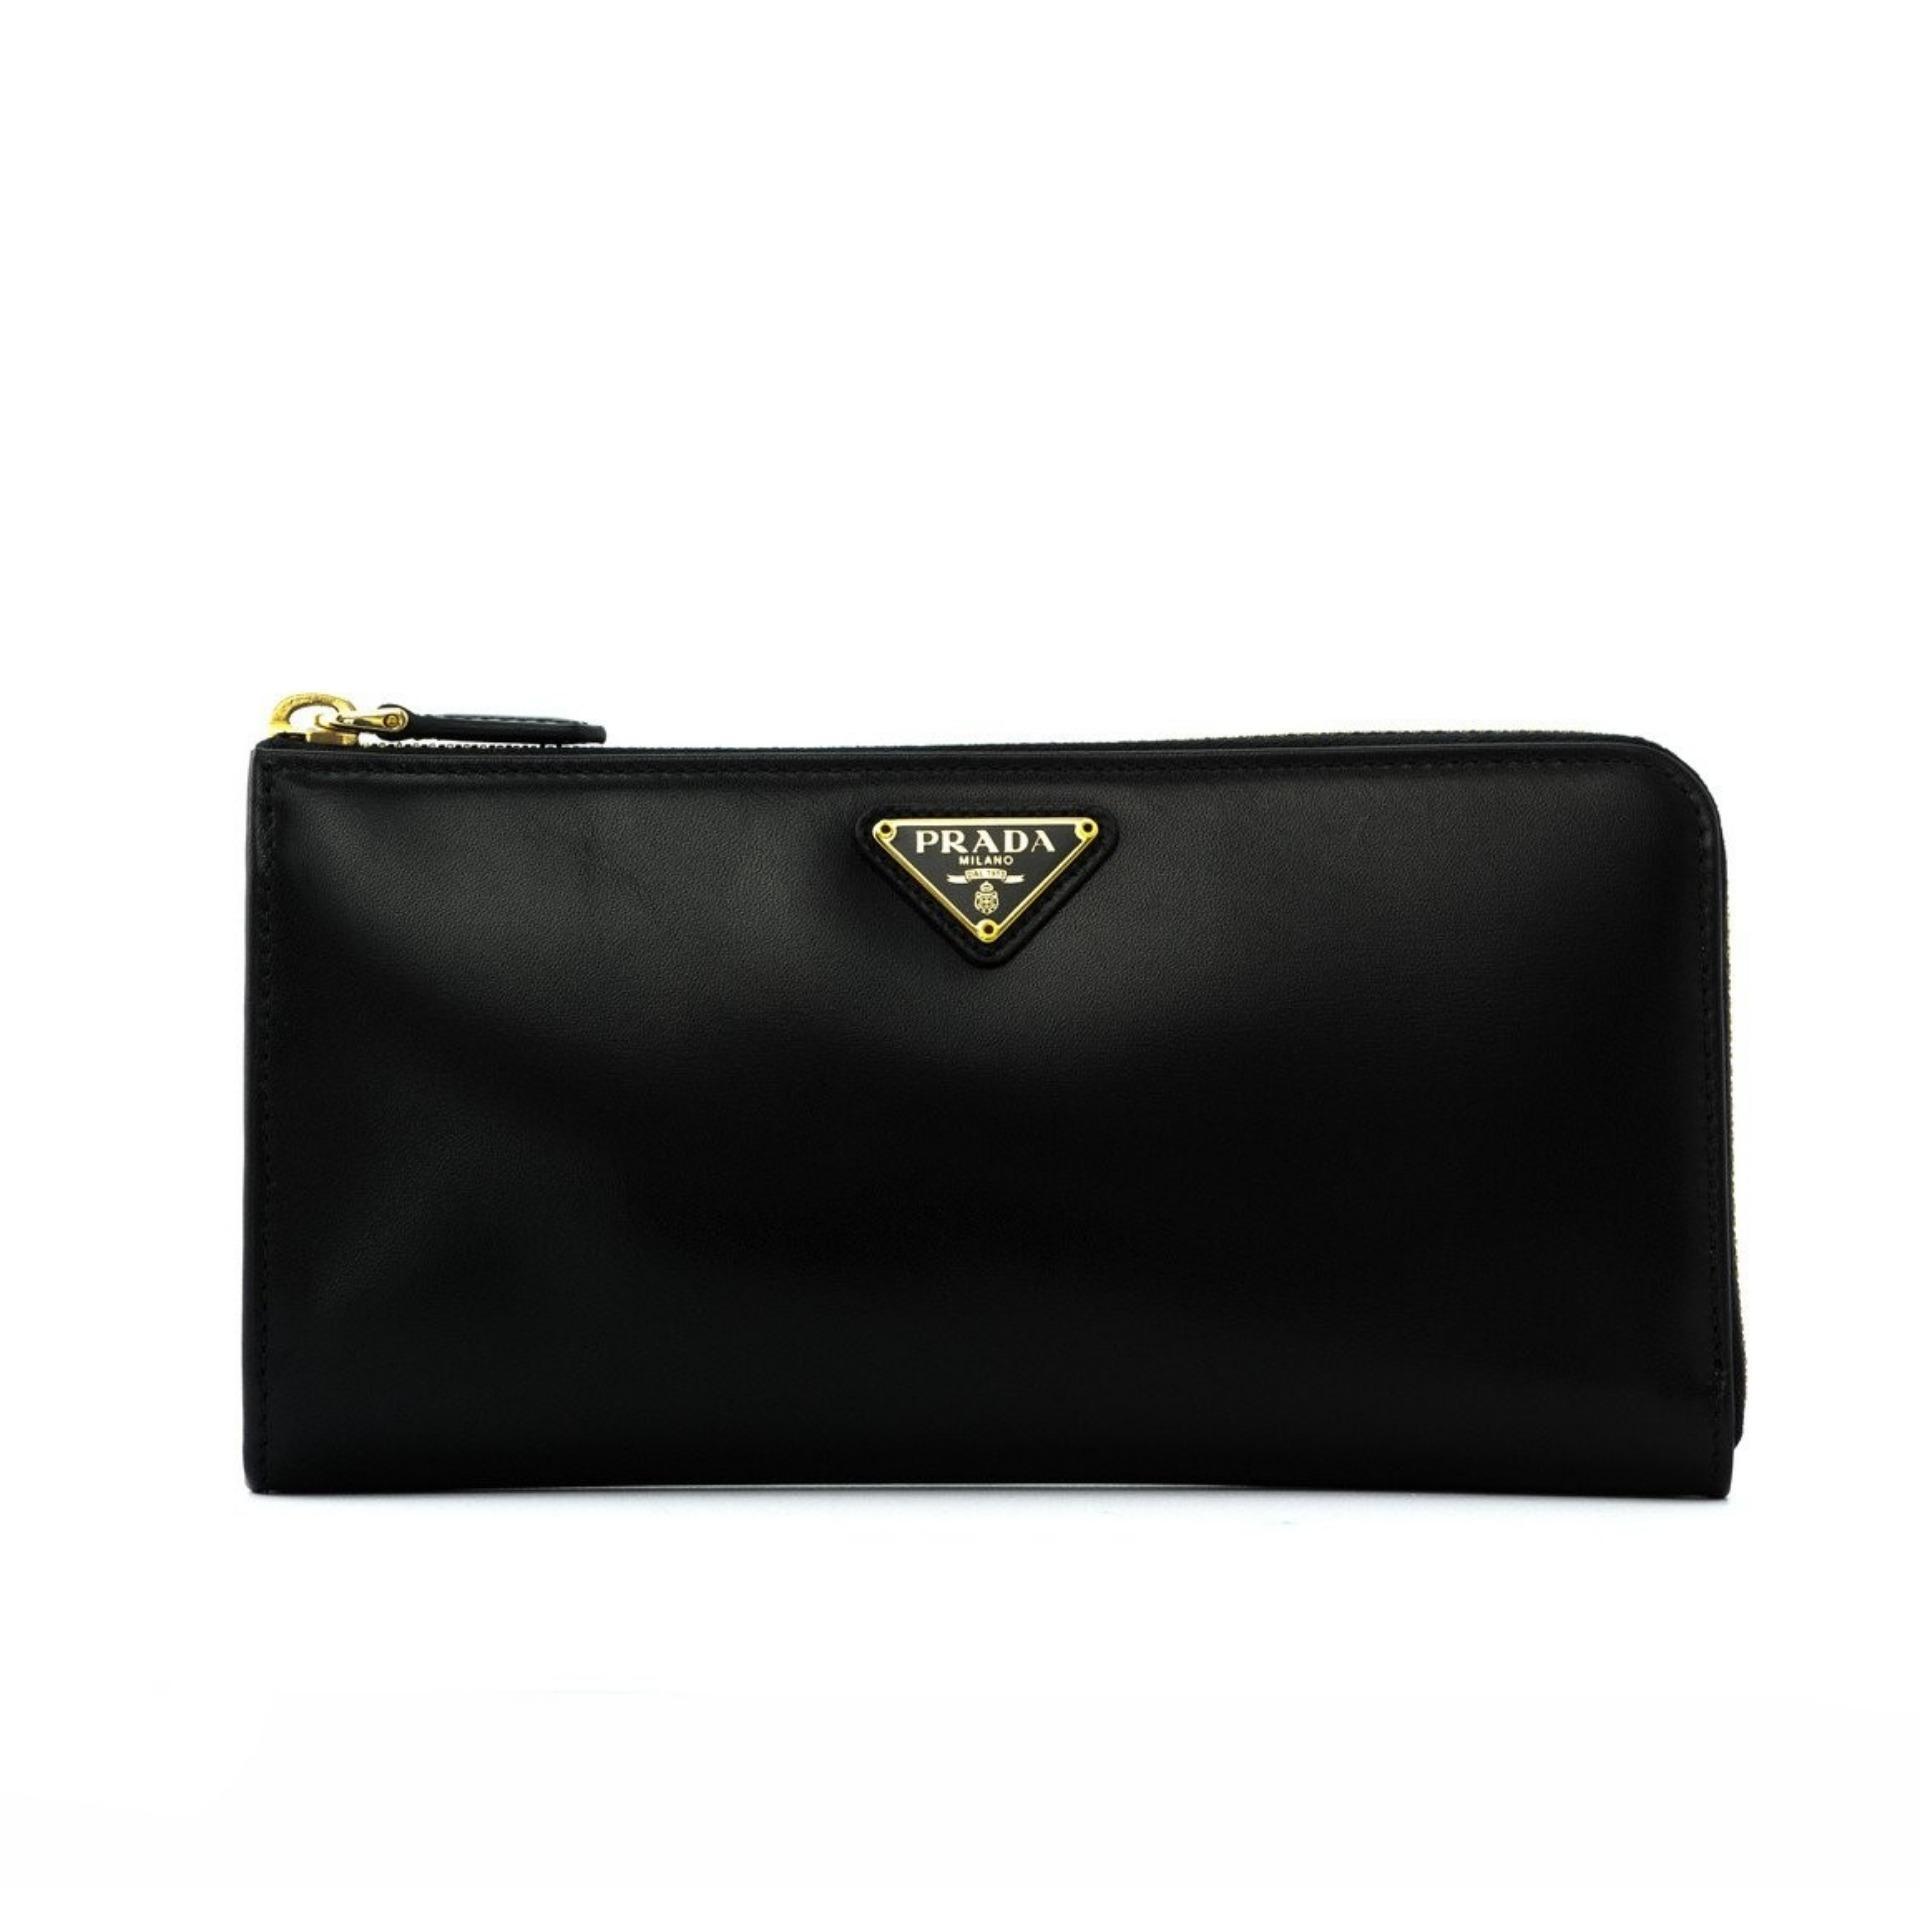 5346616840a671 Prada Saffiano Box Calf Half Zip Around Wallet (Nero/Fucco) # 1ML183309F0D9A